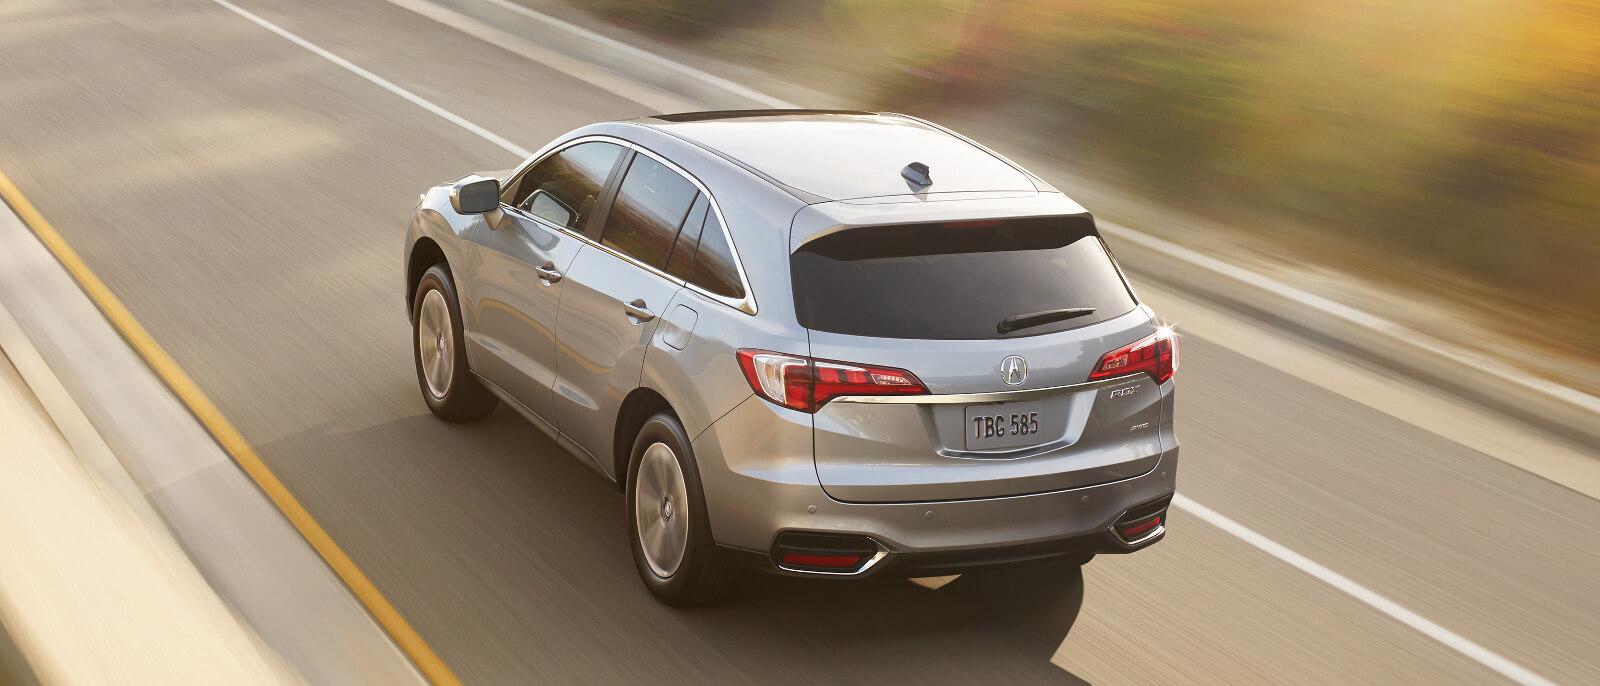 2017 Acura RDX rear exterior